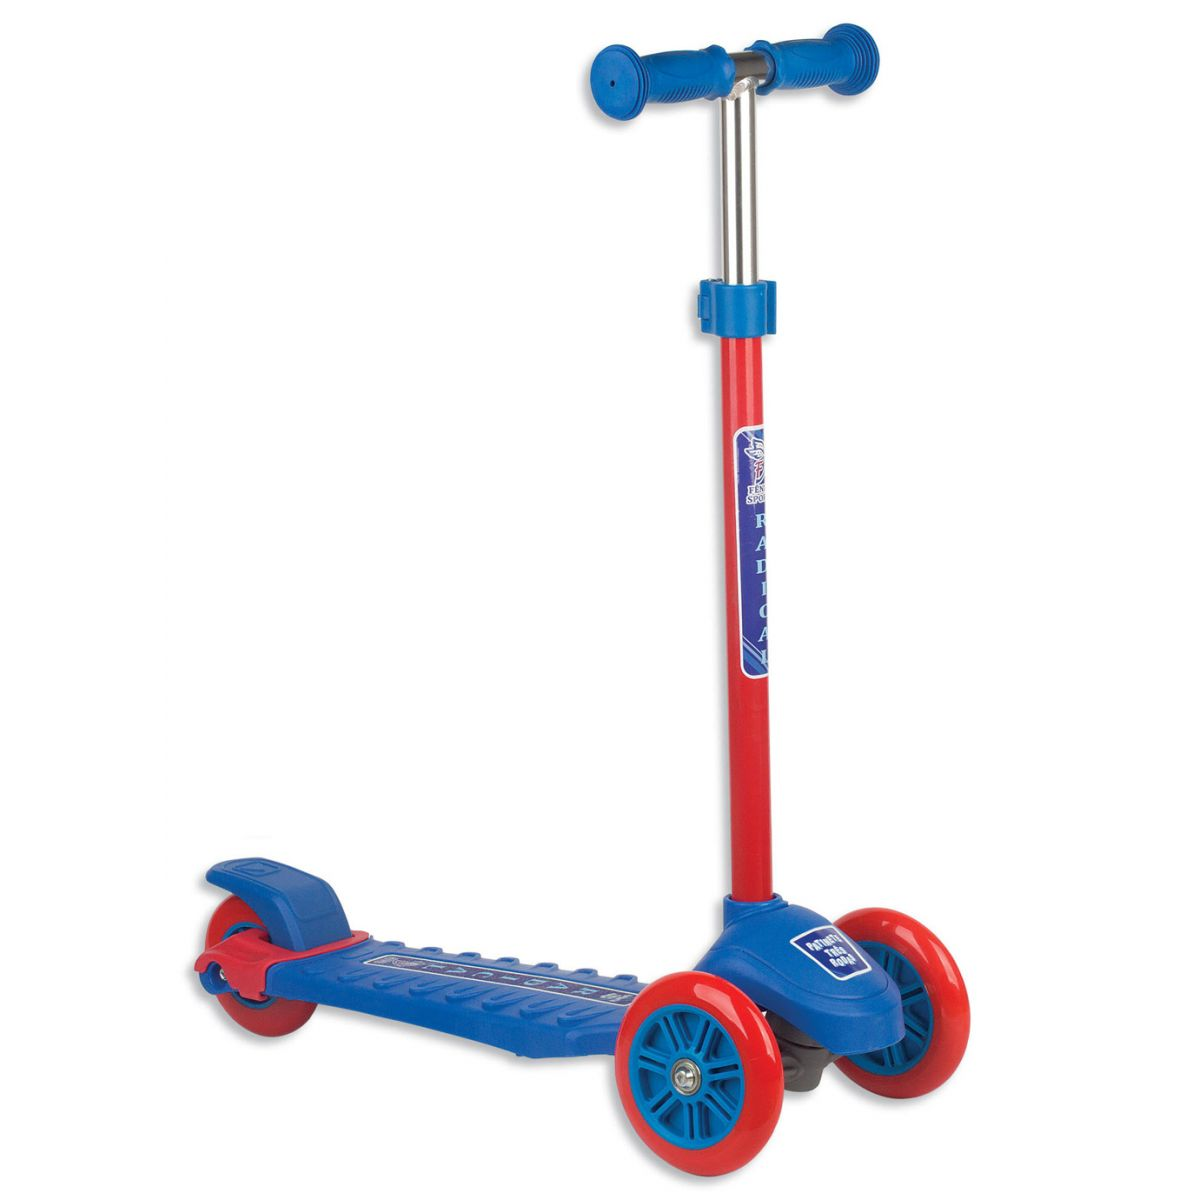 Patinete tres rodas até 70 kg Masculino - Fenix